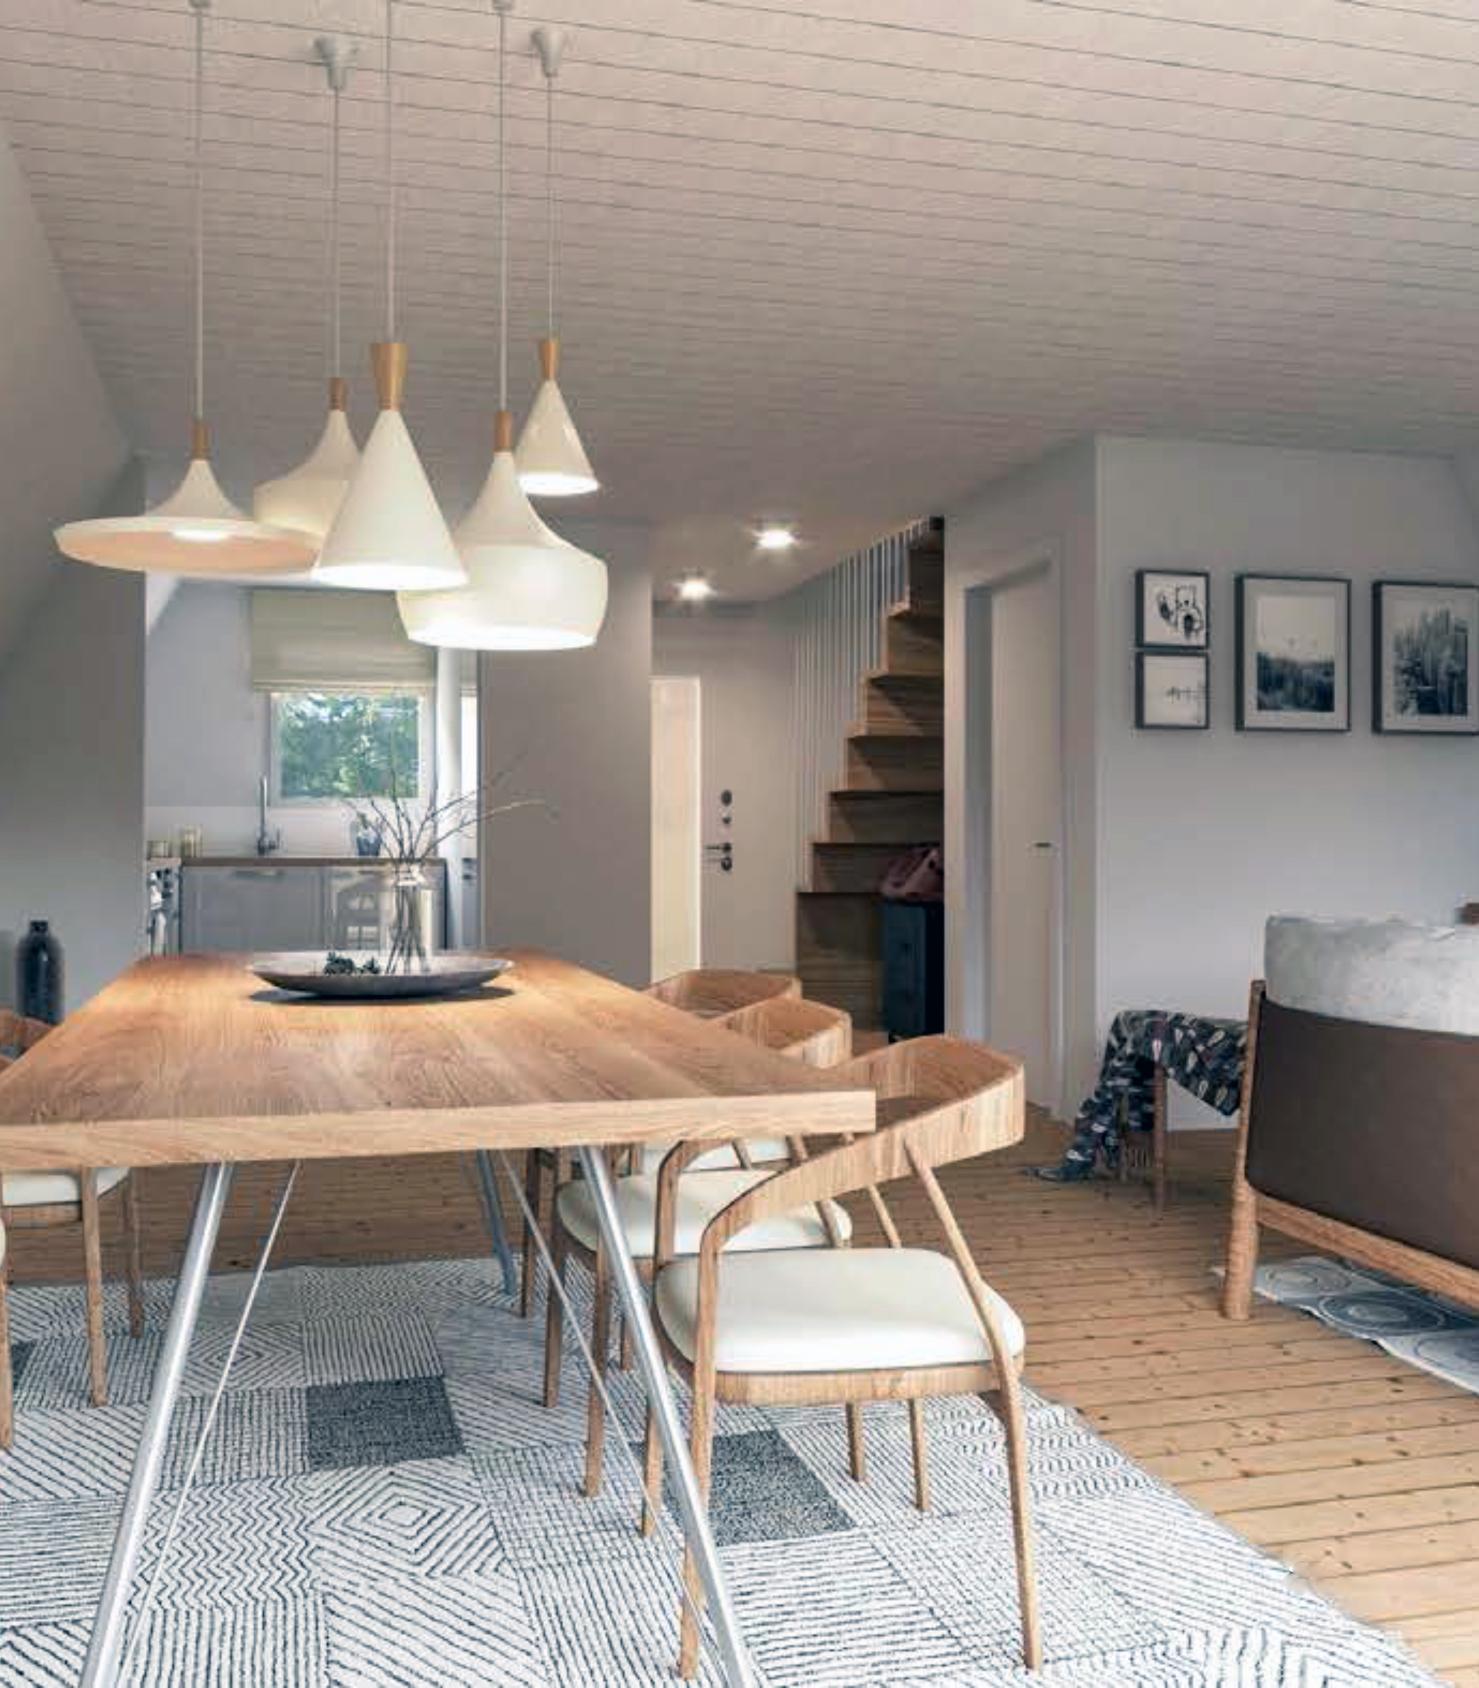 M.A.DI. premium modern cabin living interior